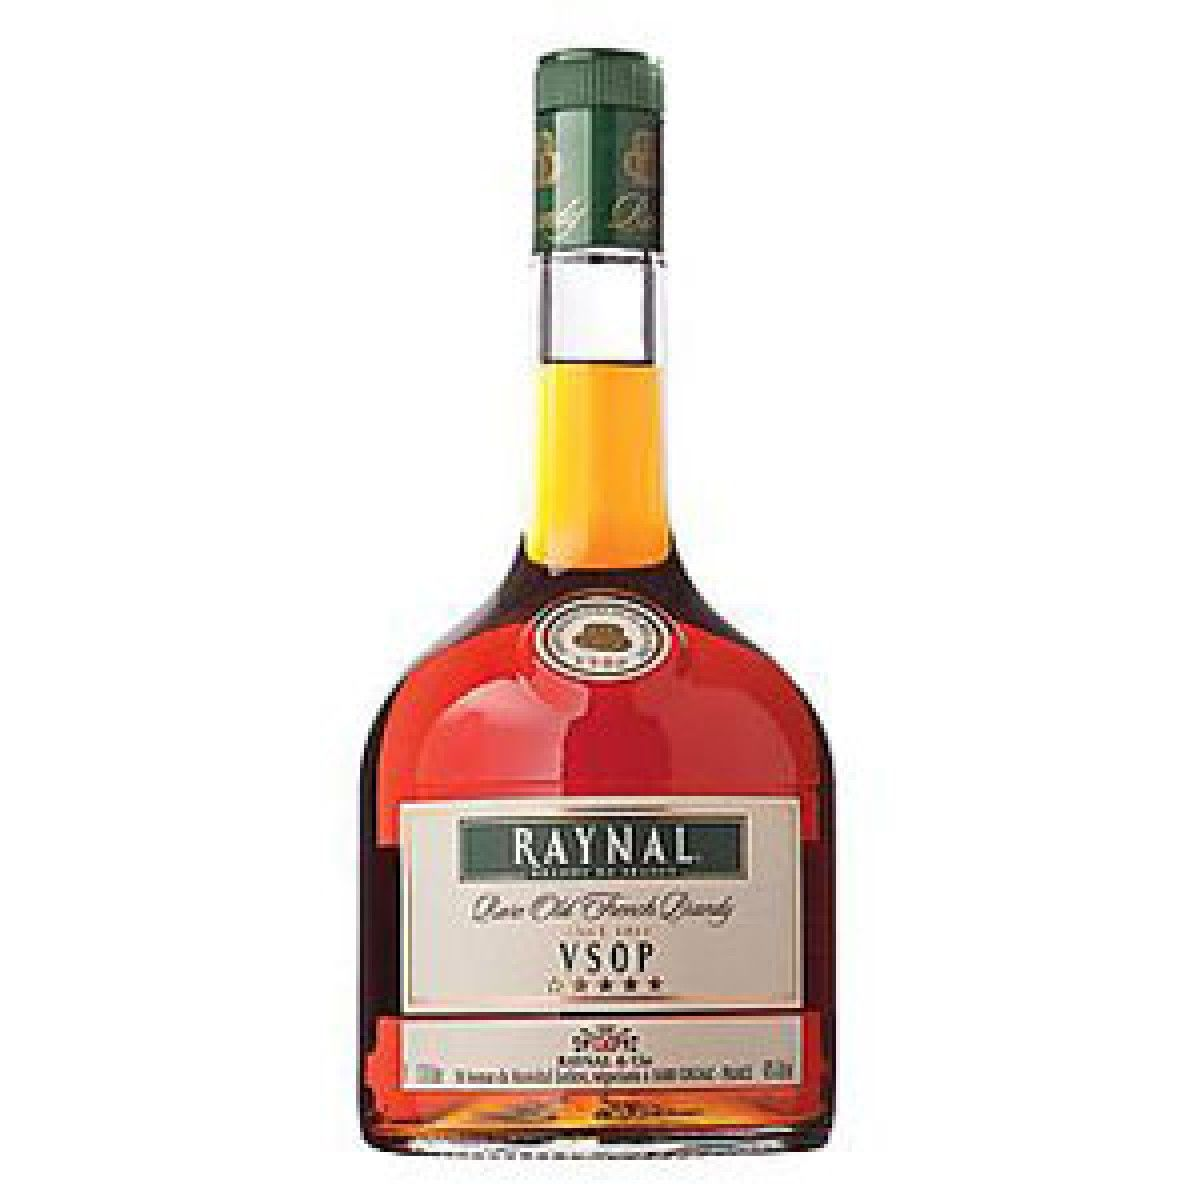 Raynal Brandy Vsop 750ml Brandy Macallan Whiskey Bottle Whiskey Bottle